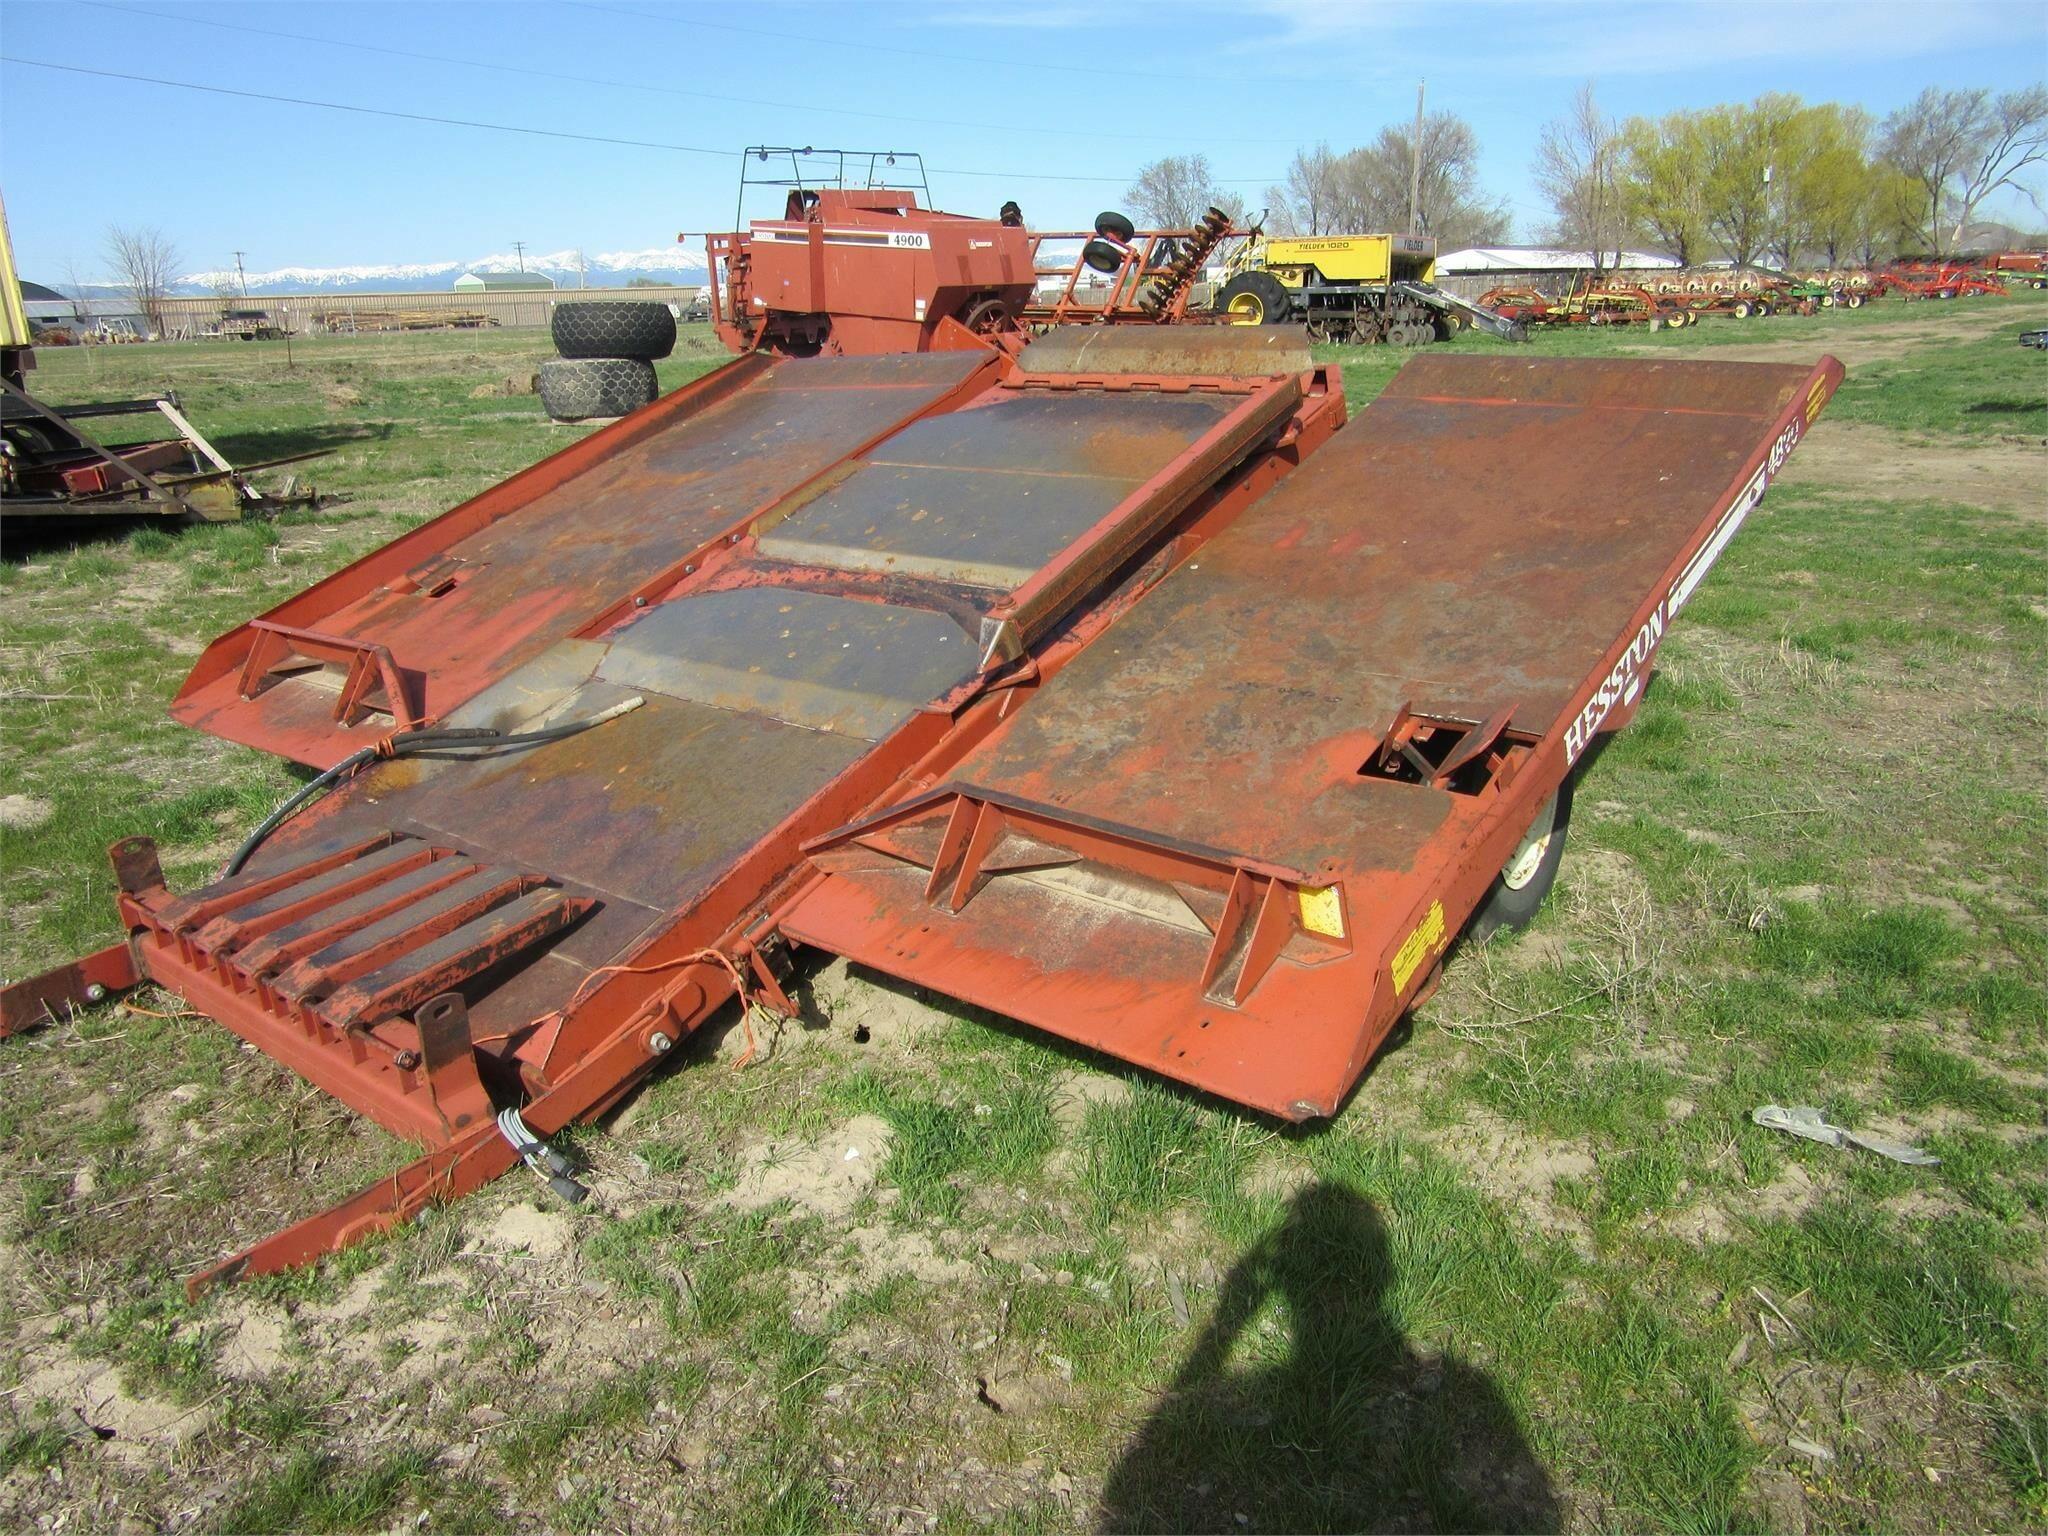 Hesston 4820 Bale Wagons and Trailer